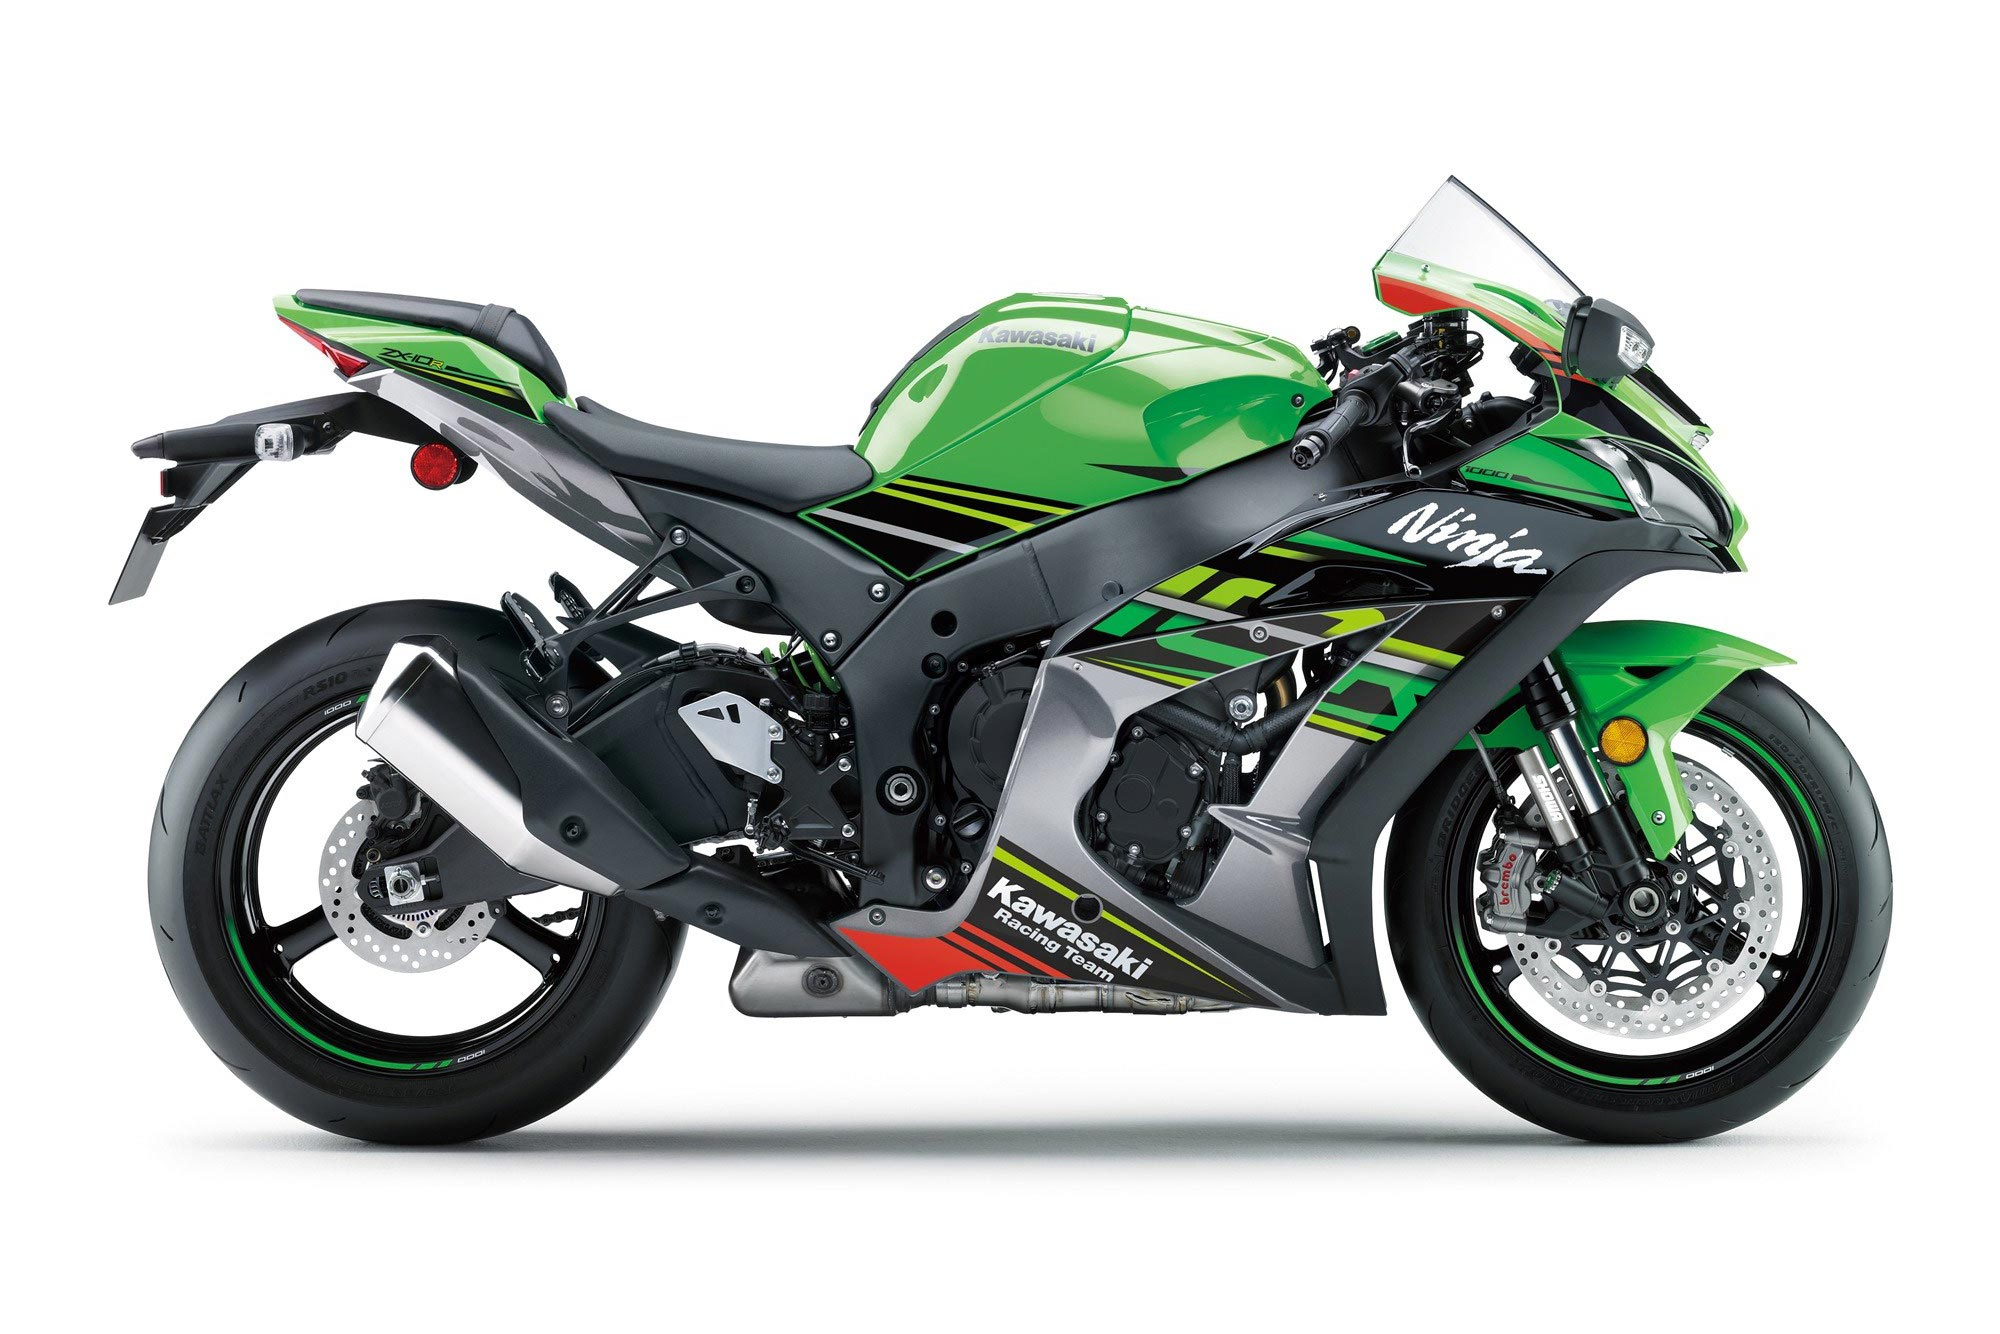 2019 Kawasaki Ninja ZX-10R Debuts with 200hp Engine